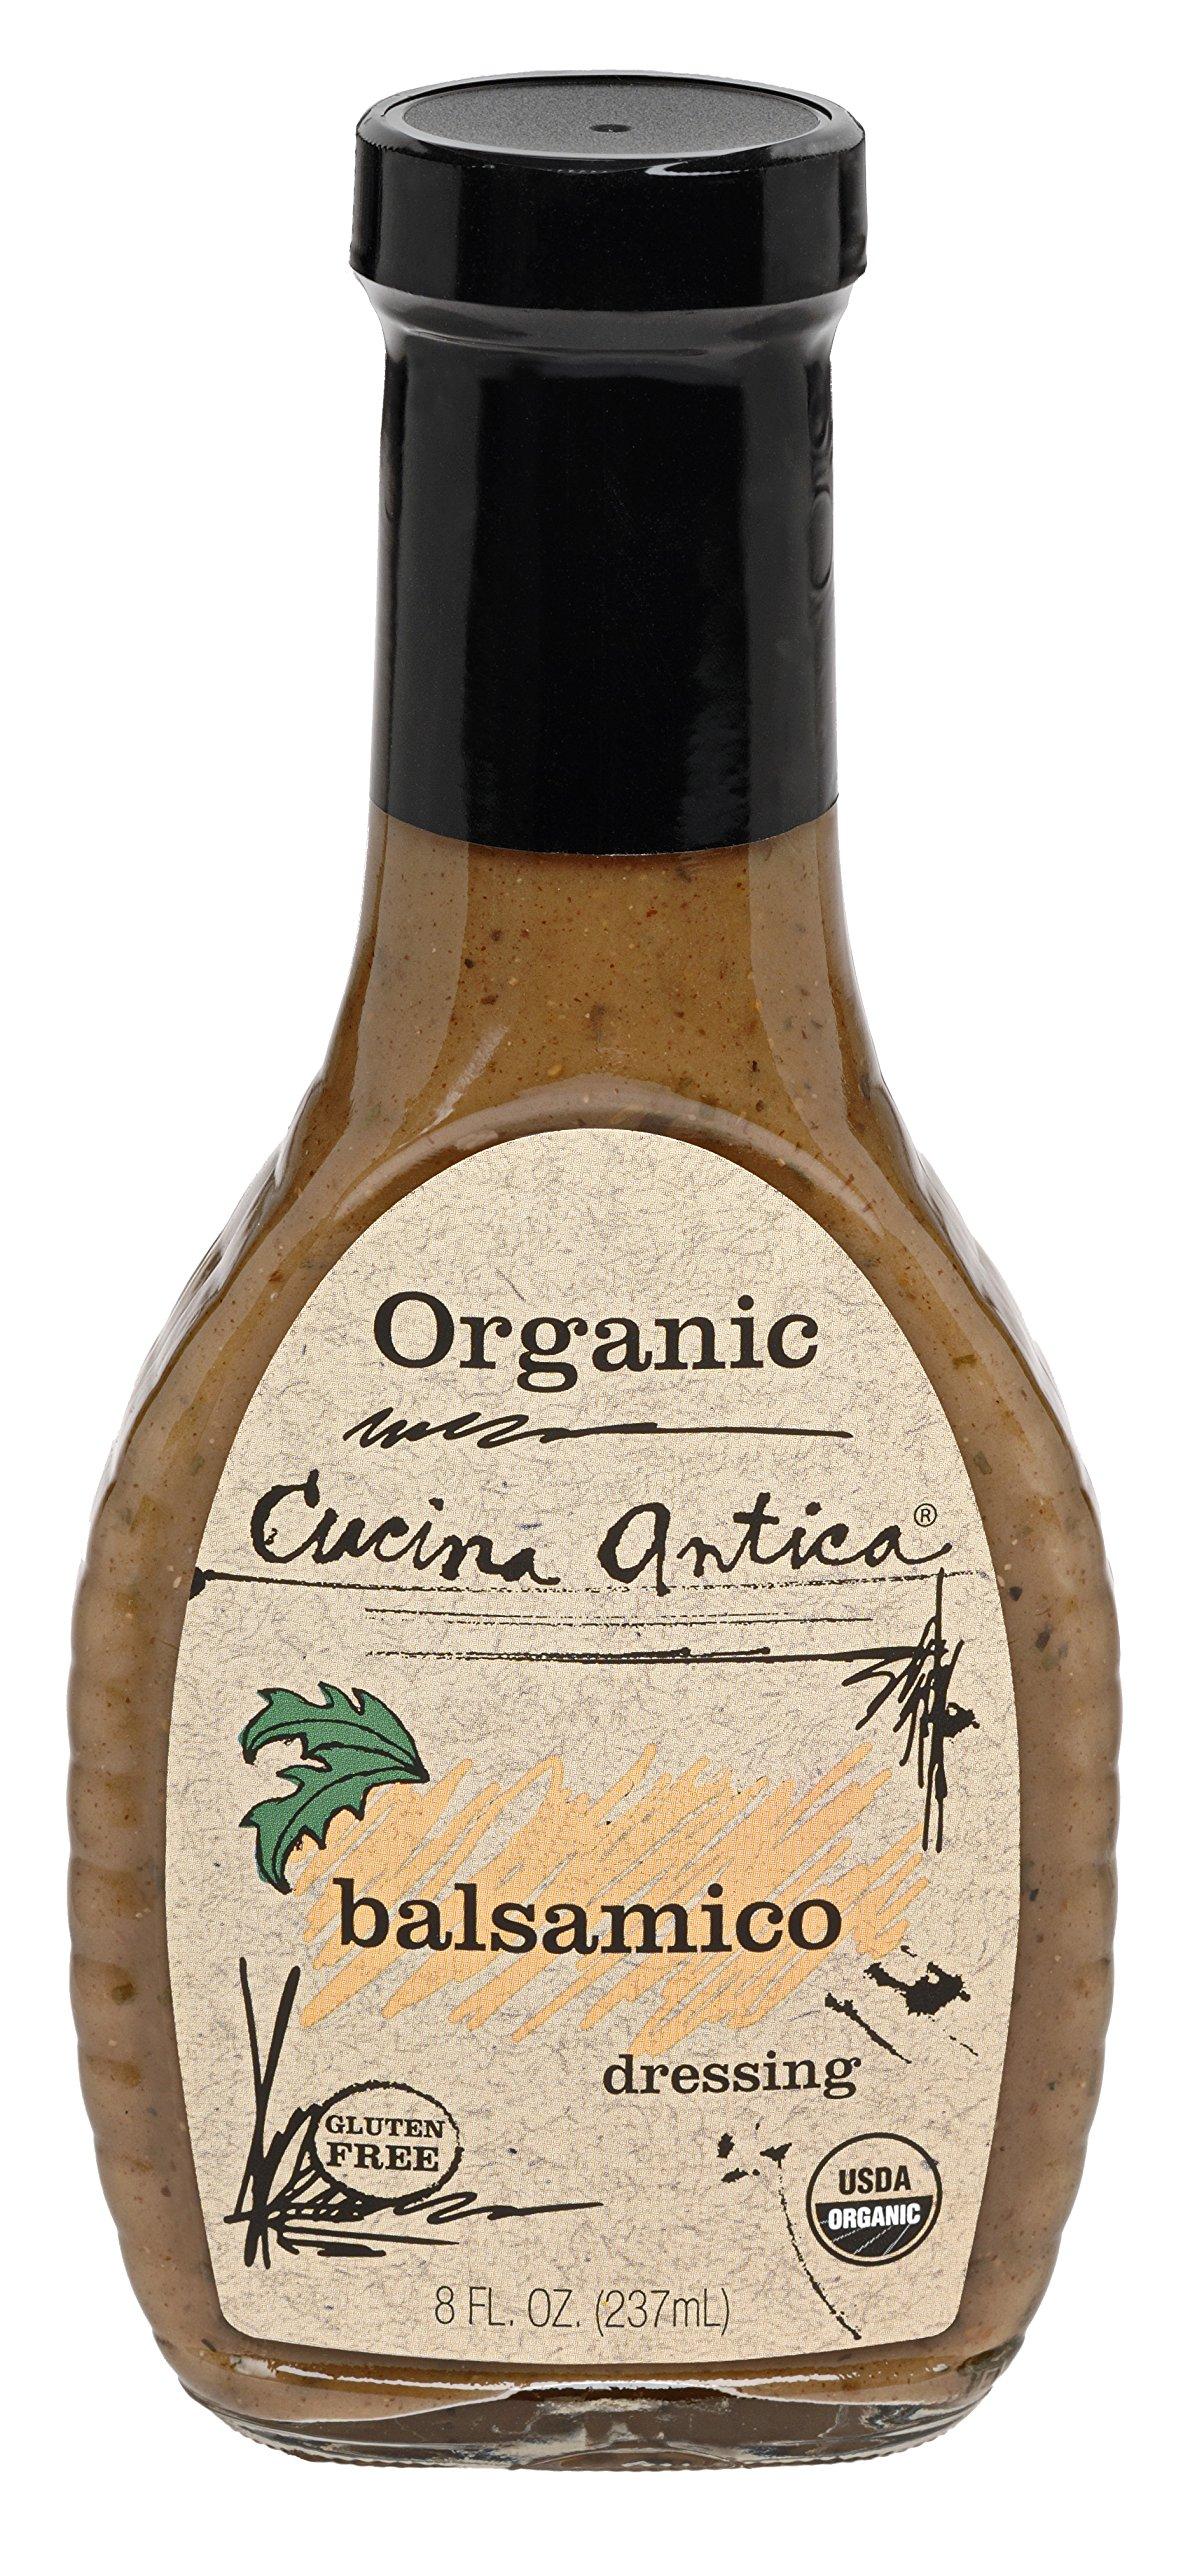 Cucina Antica Organic Balsamico Dressing, 8 oz